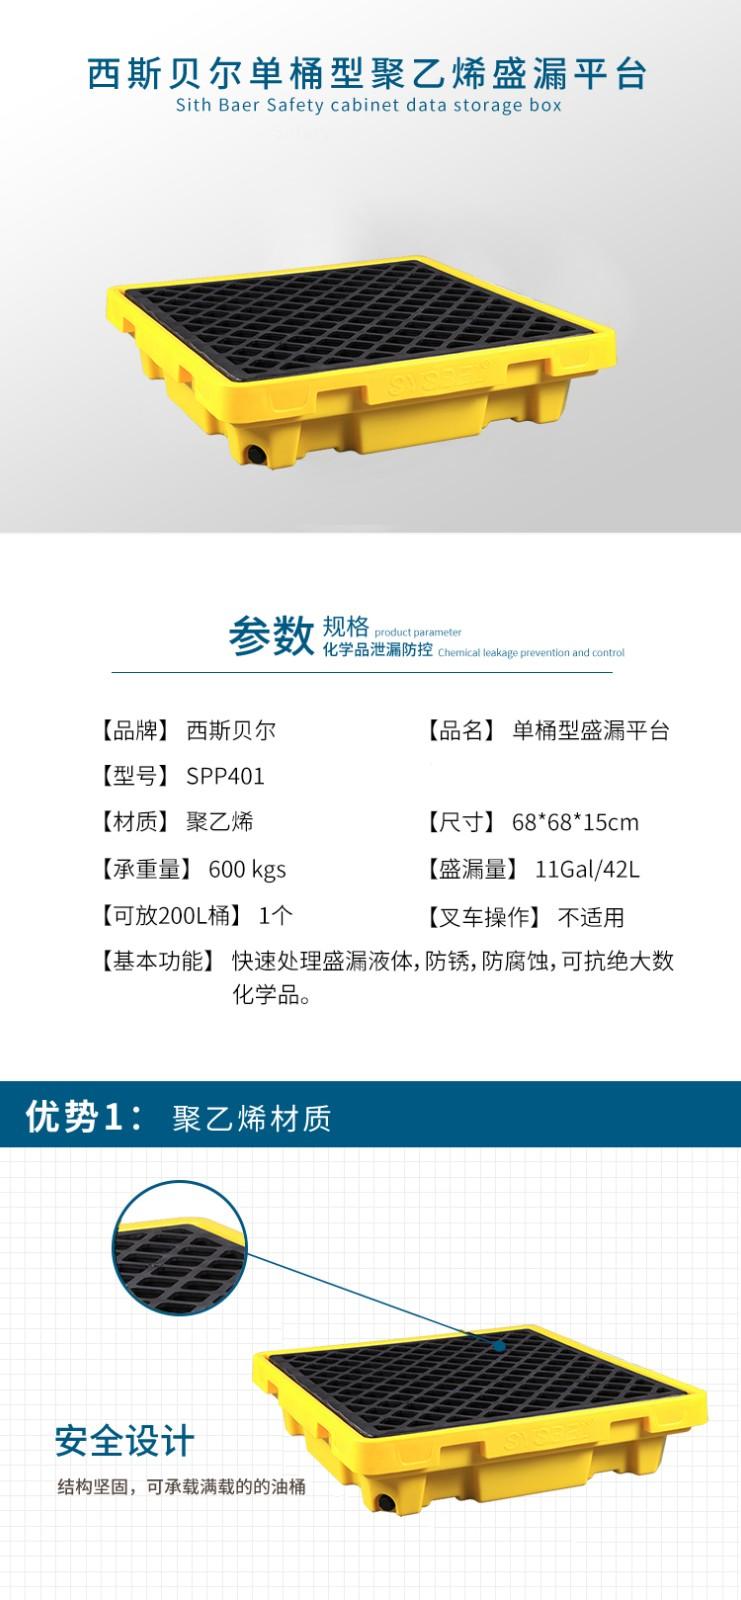 SYSBEL/西斯贝尔 SPP401 聚乙烯盛漏平台